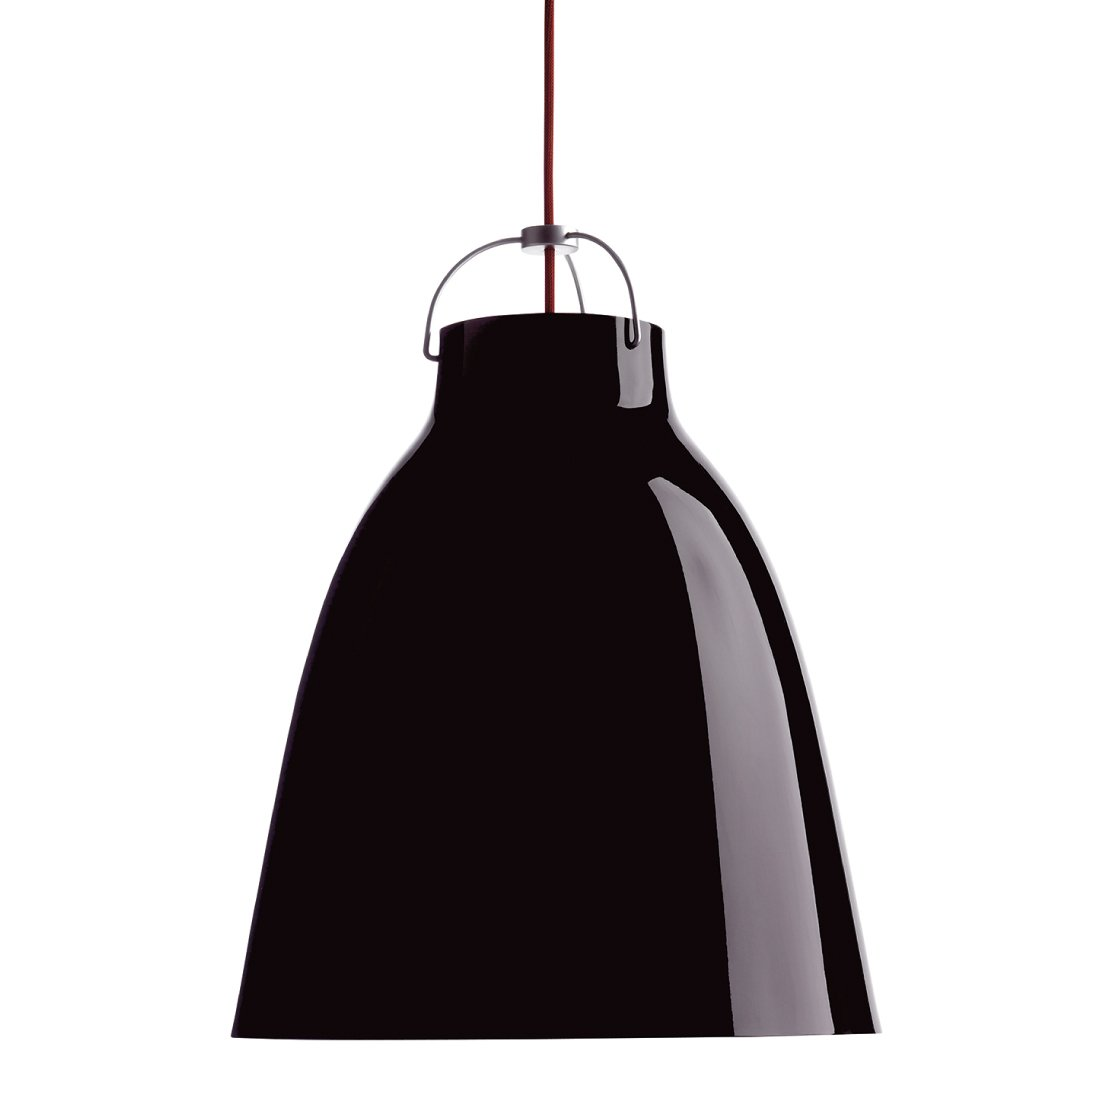 Lightyears Caravaggio P3 Hoogglans Zwart - Rood - Snoer 600 cm